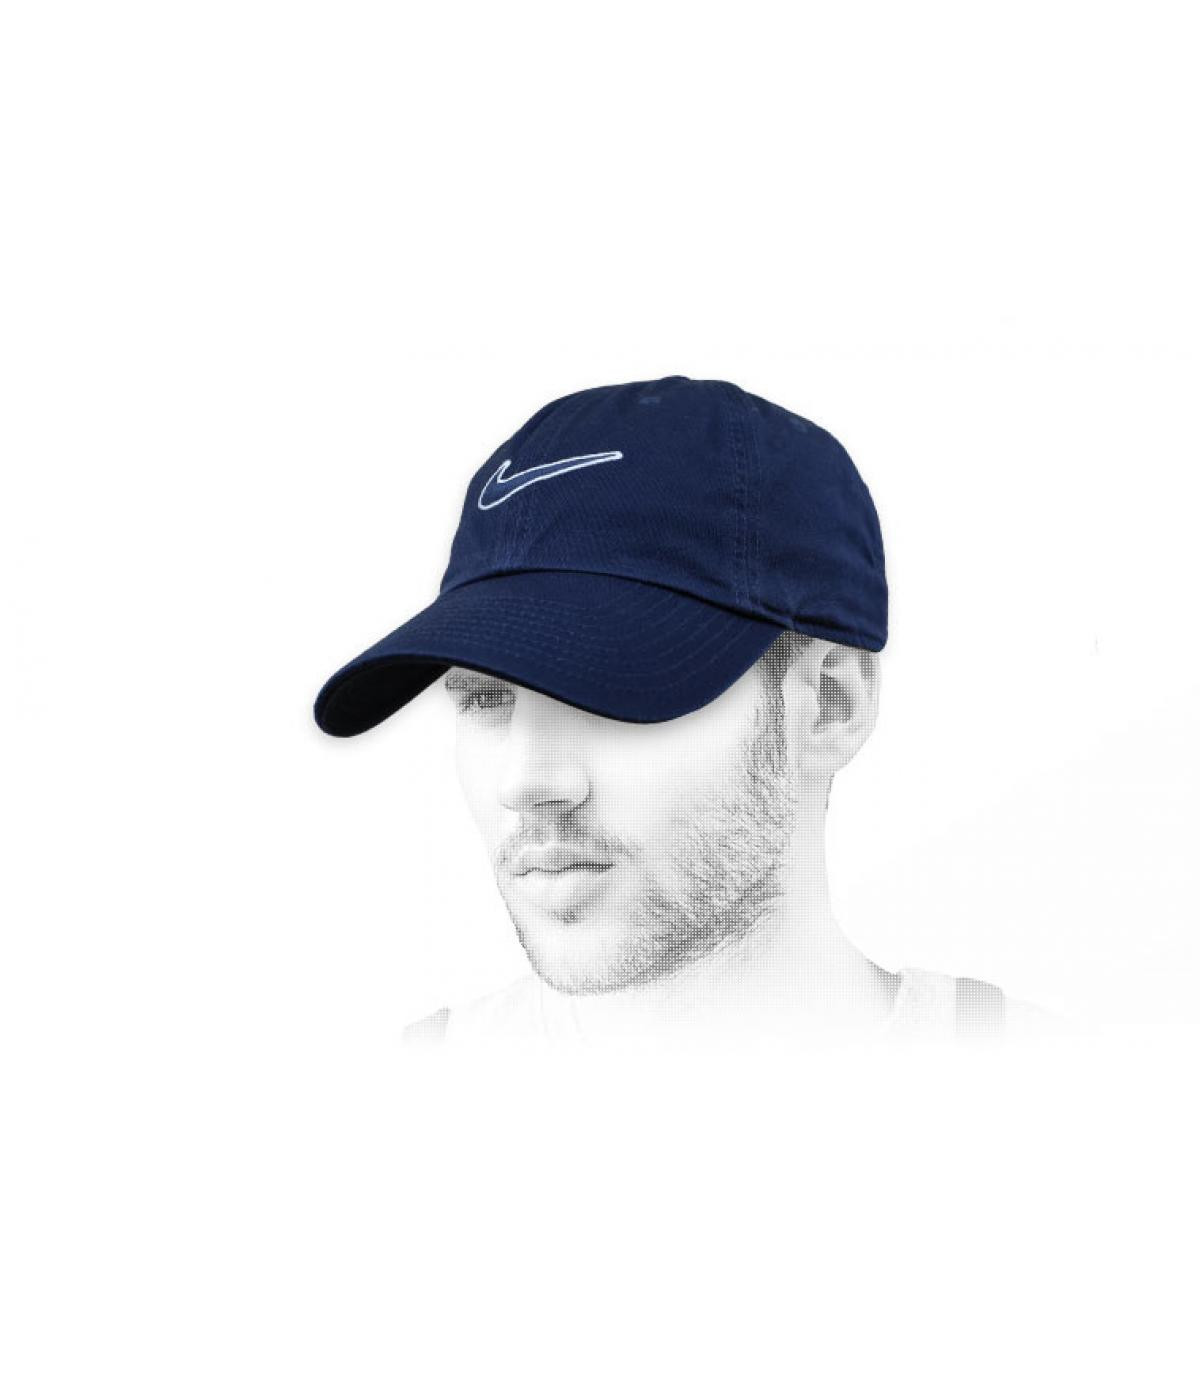 gorra Nike swoosh negro